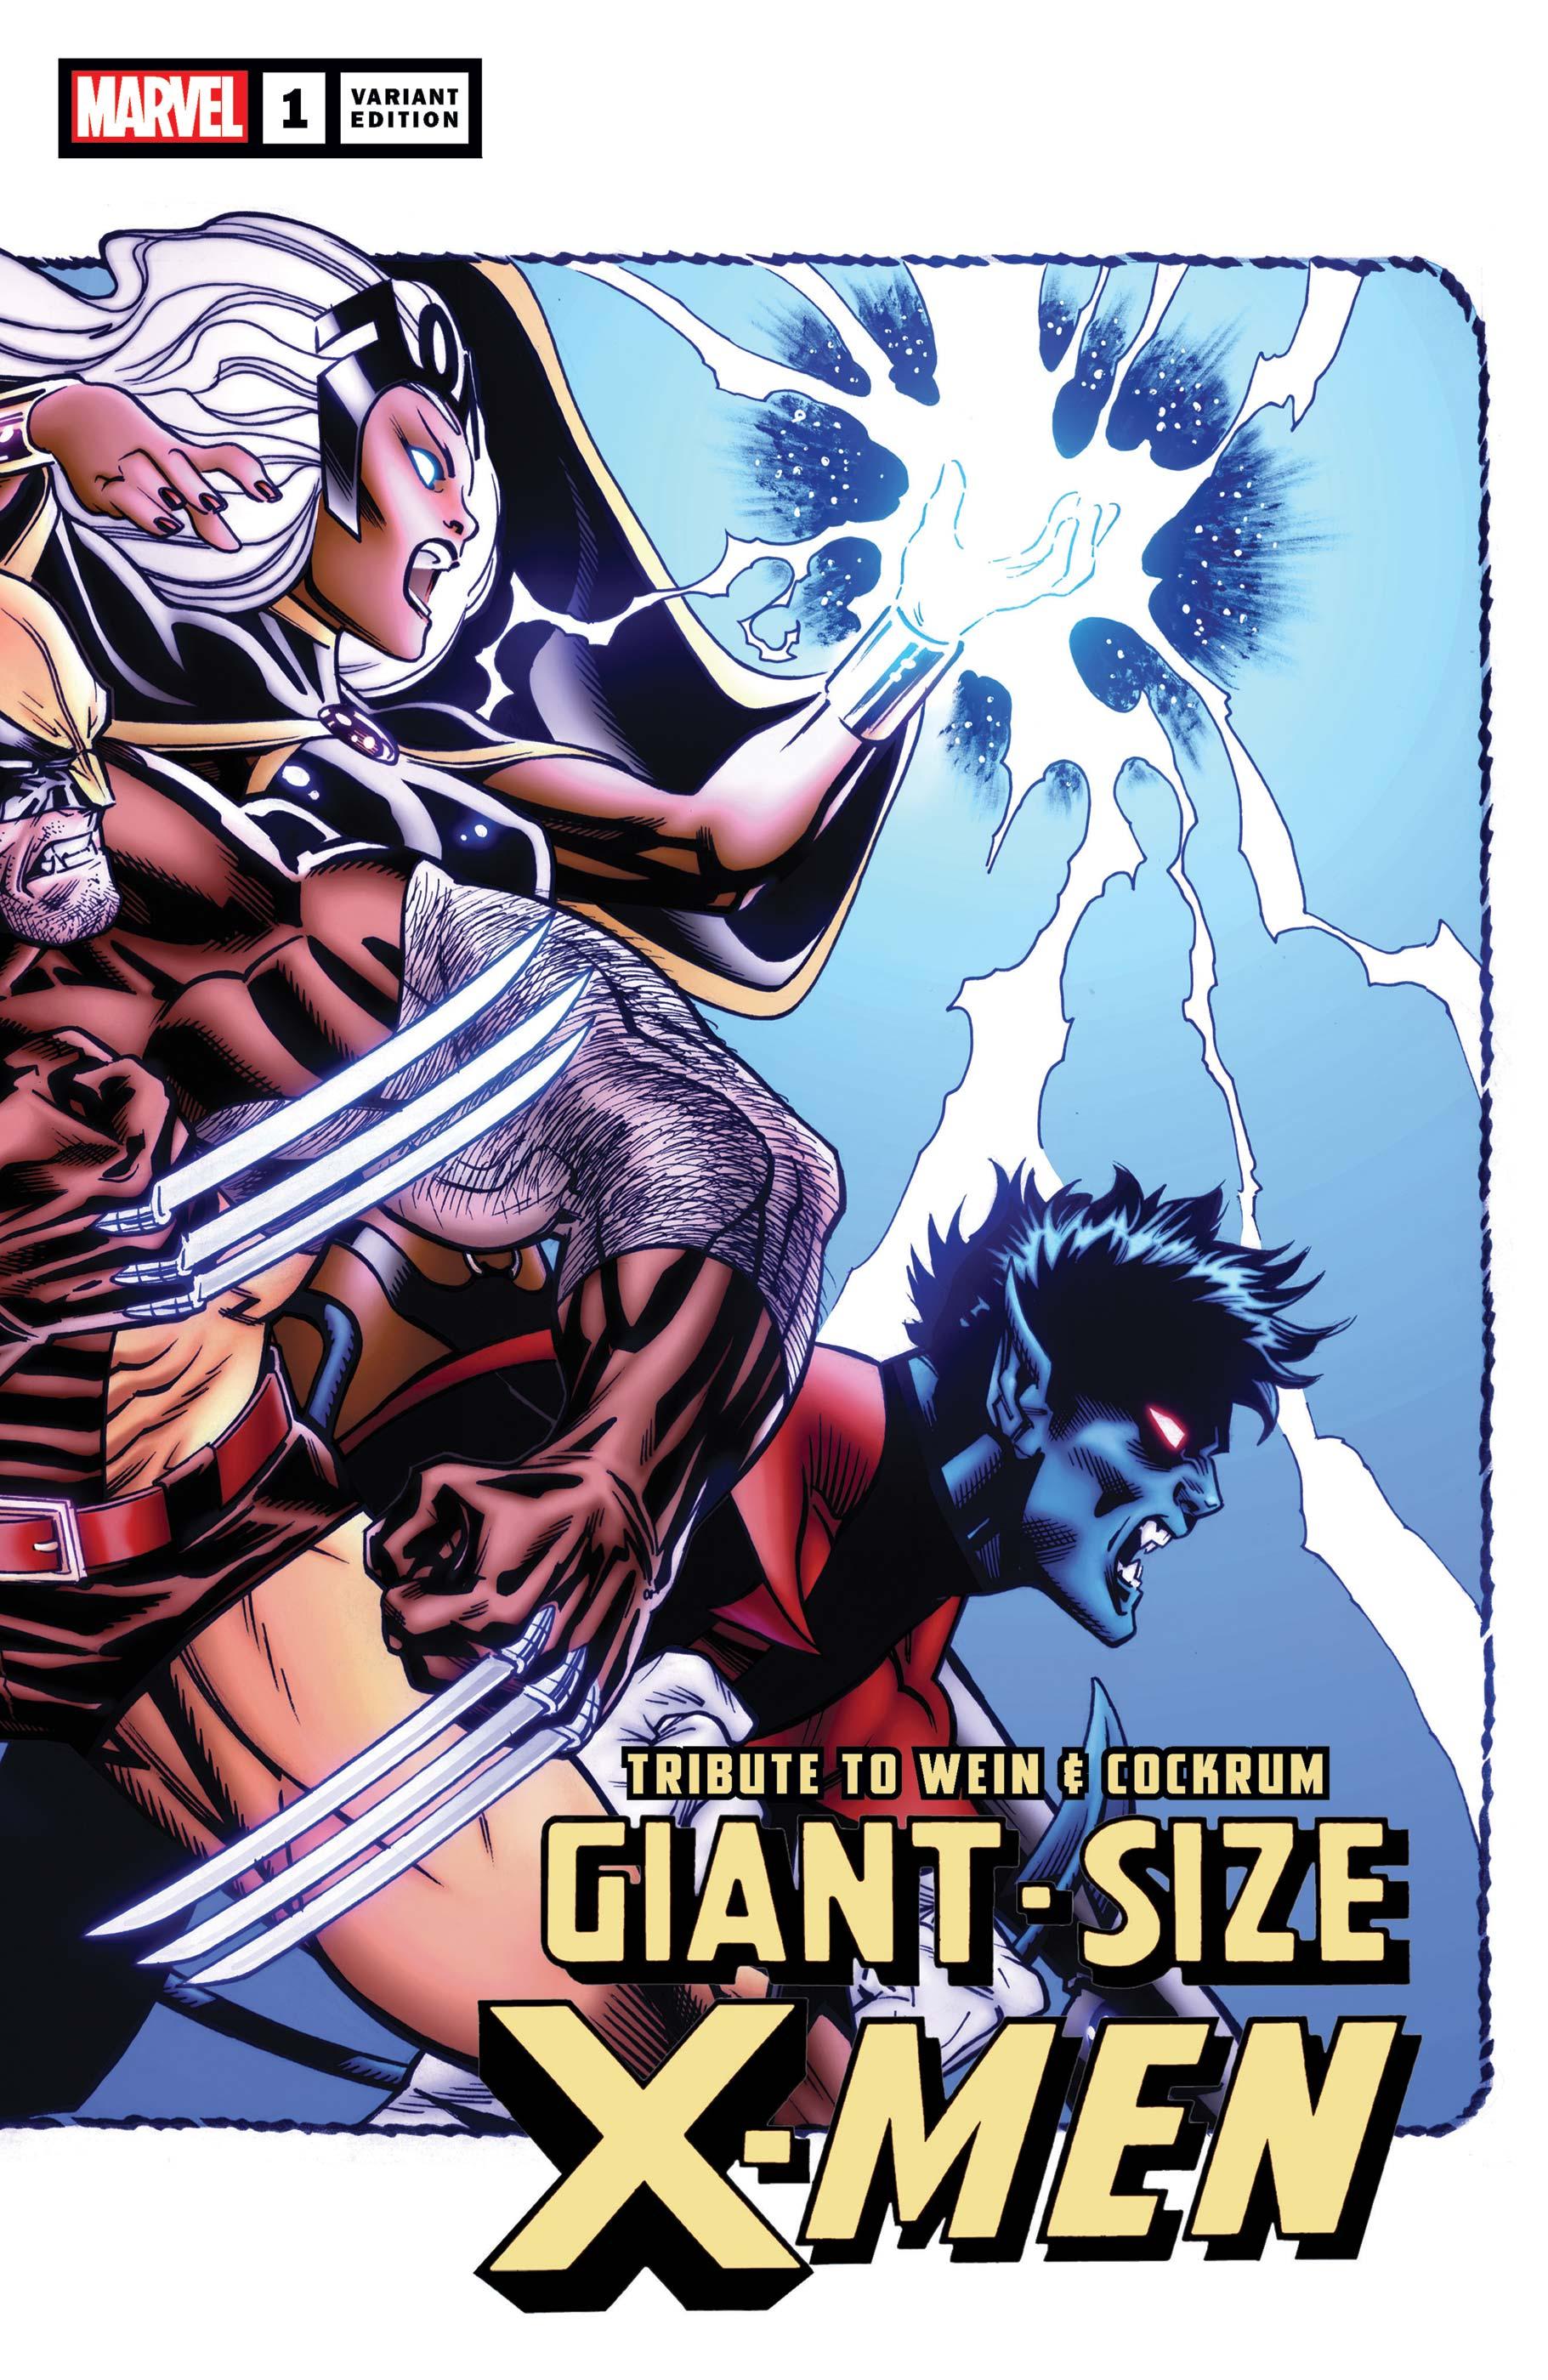 WEIN COCKRUM GIANT-SIZE X-MEN TRIBUTE #1 ADI GRANOV//TRADD MOORE VARIANT SET NM